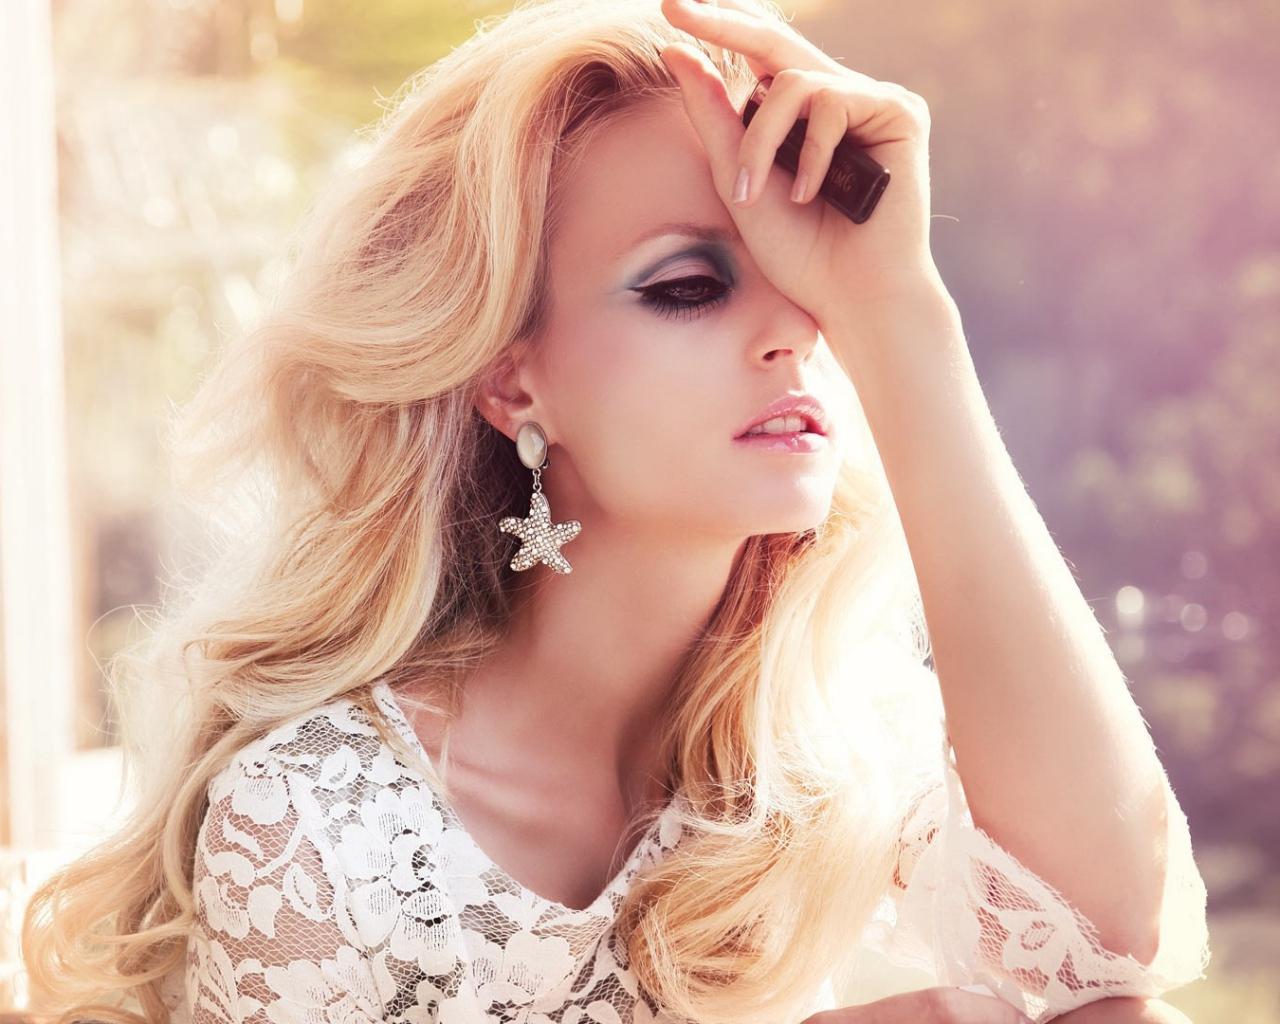 blonde_woman_dress_lace_lighter_64100_1280x1024